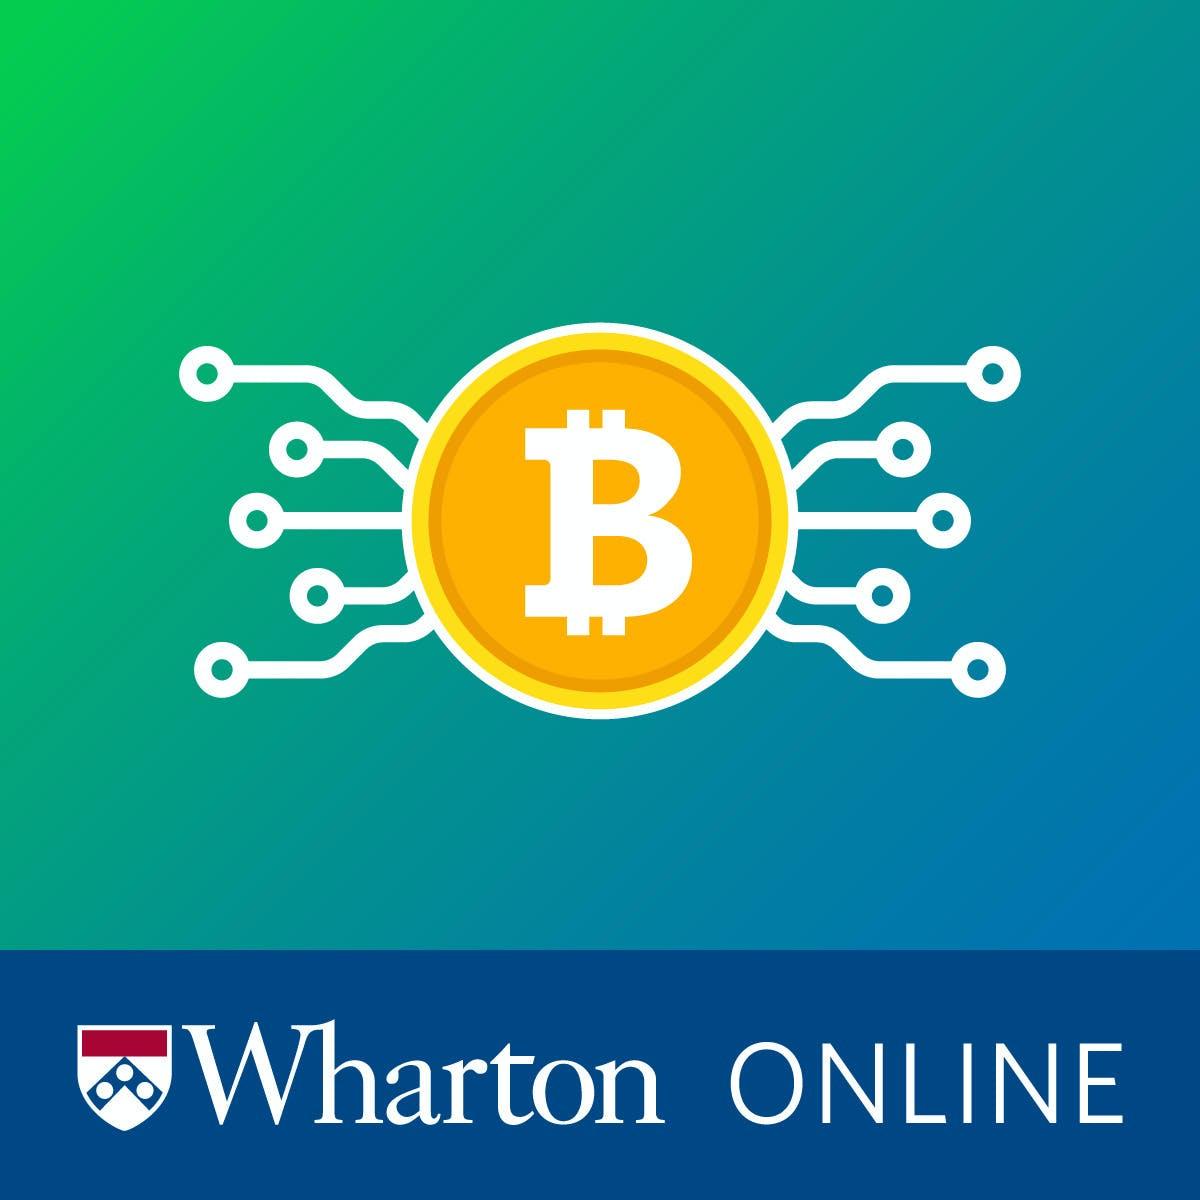 Ethereum e trading di bitcoin luigirota.it